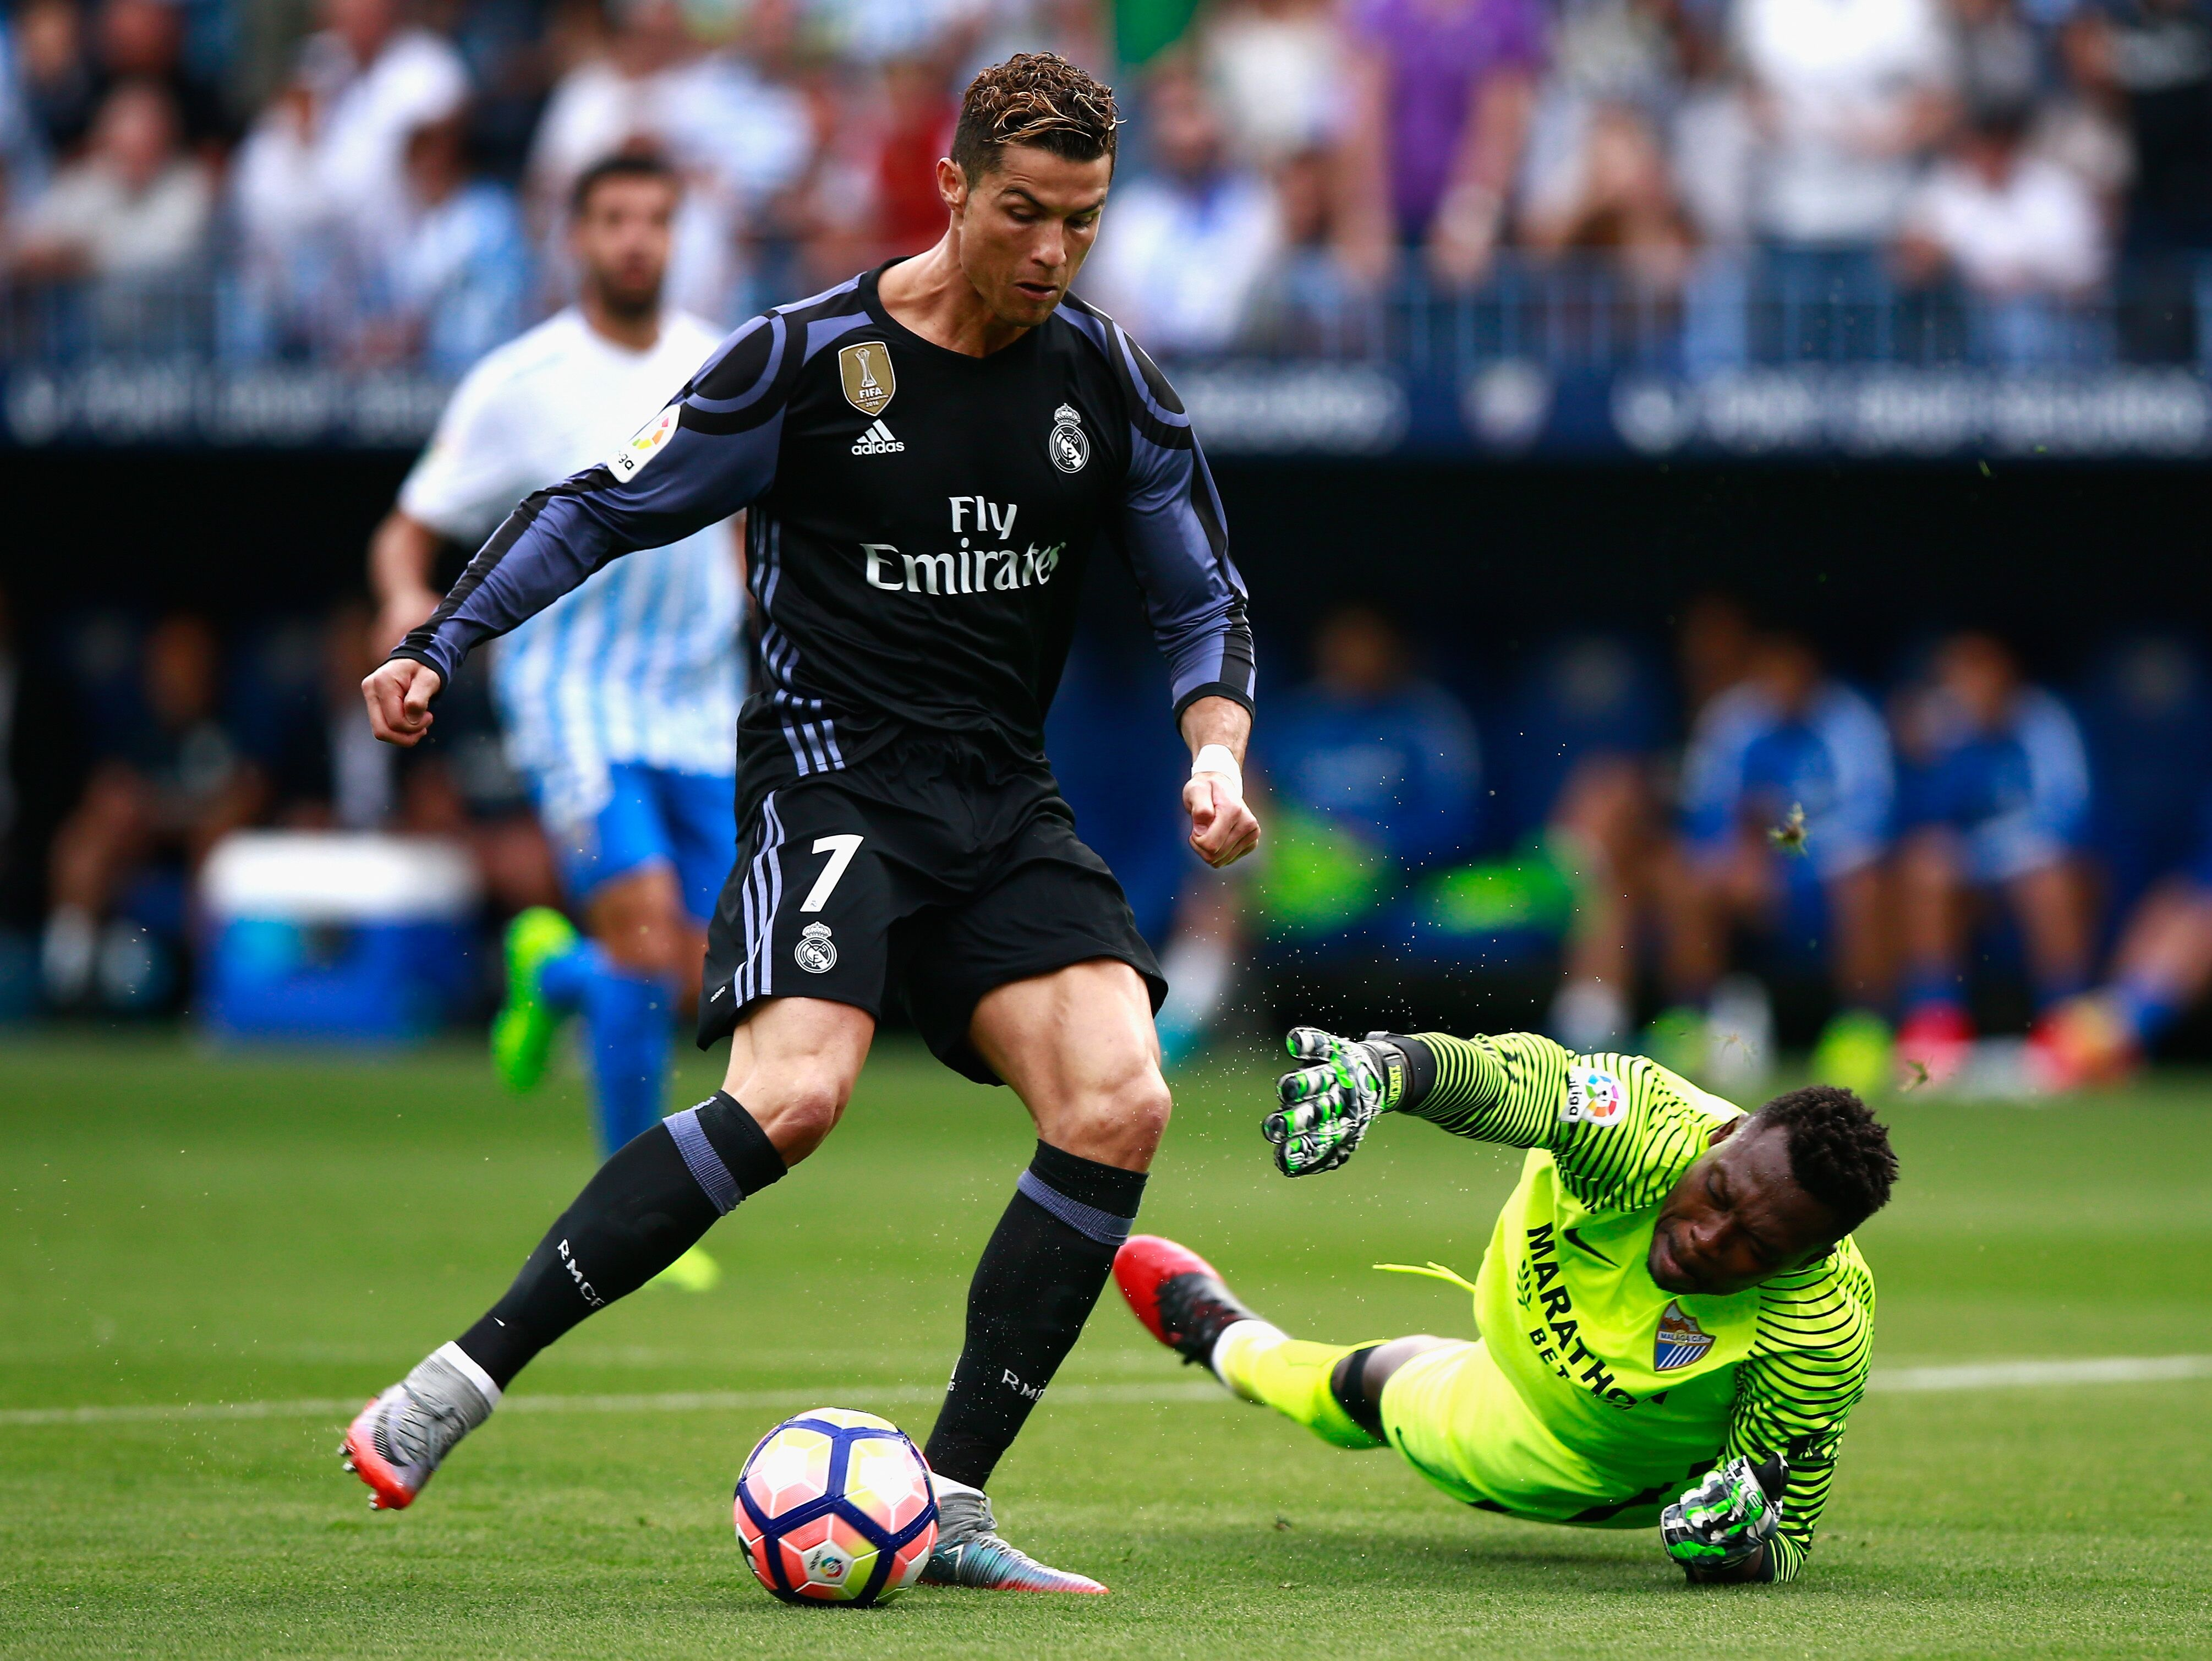 Watch Getafe Cf Vs Real Madrid Live Stream La Liga: Athletic Bilbao Vs. Real Madrid Live Stream: Watch La Liga